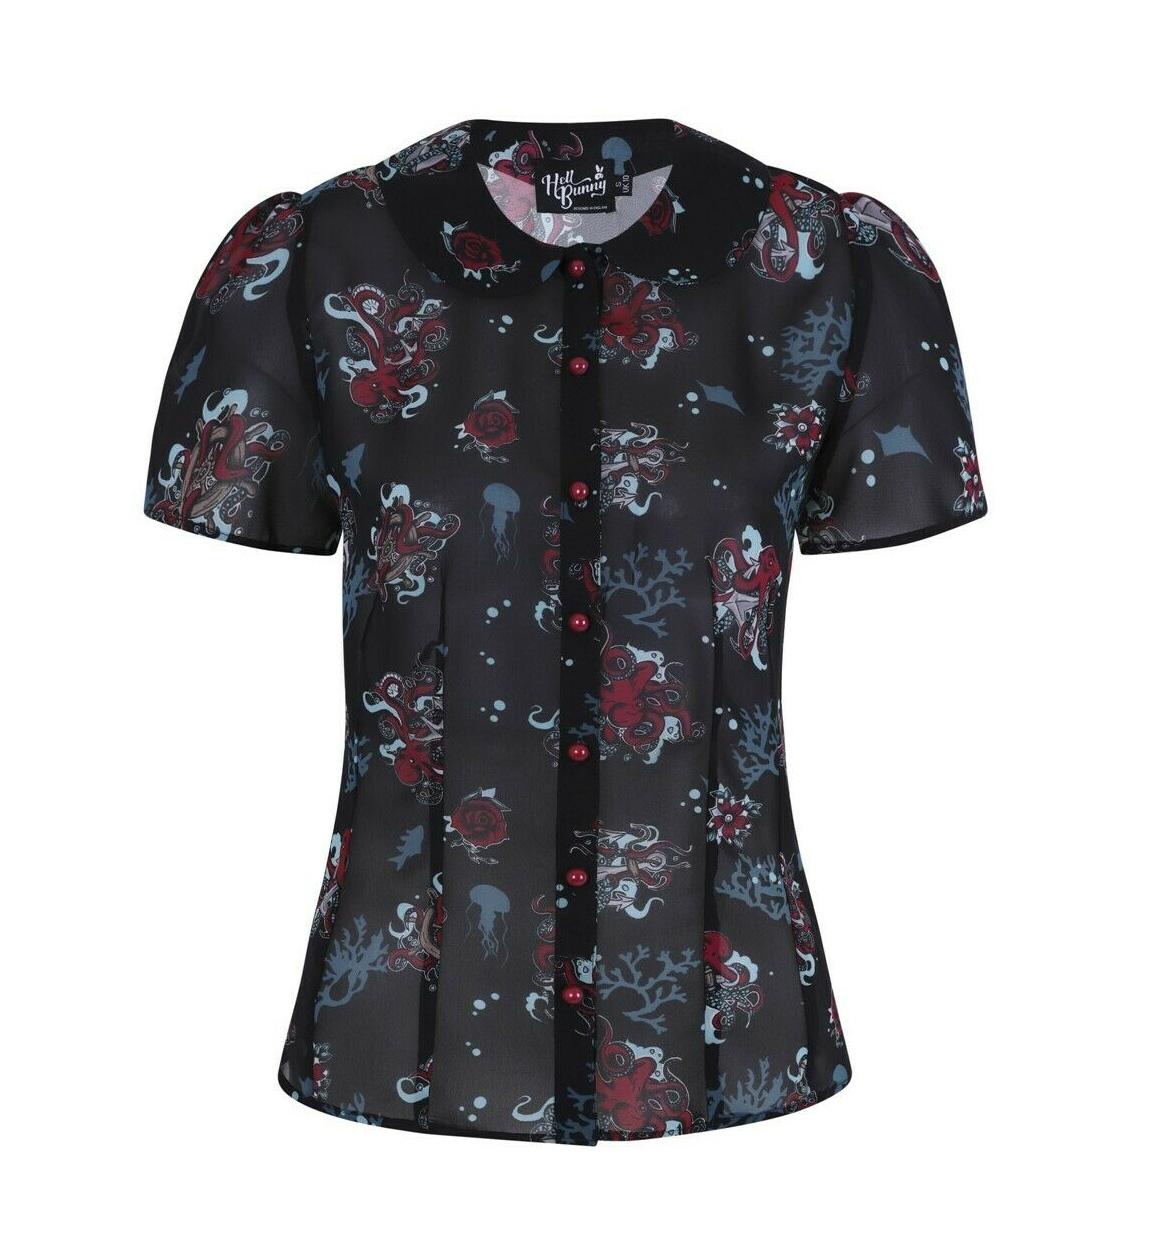 Hell-Bunny-50s-Shirt-Top-Black-Ocean-Octopus-Roses-POSEIDON-Blouse-All-Sizes thumbnail 47